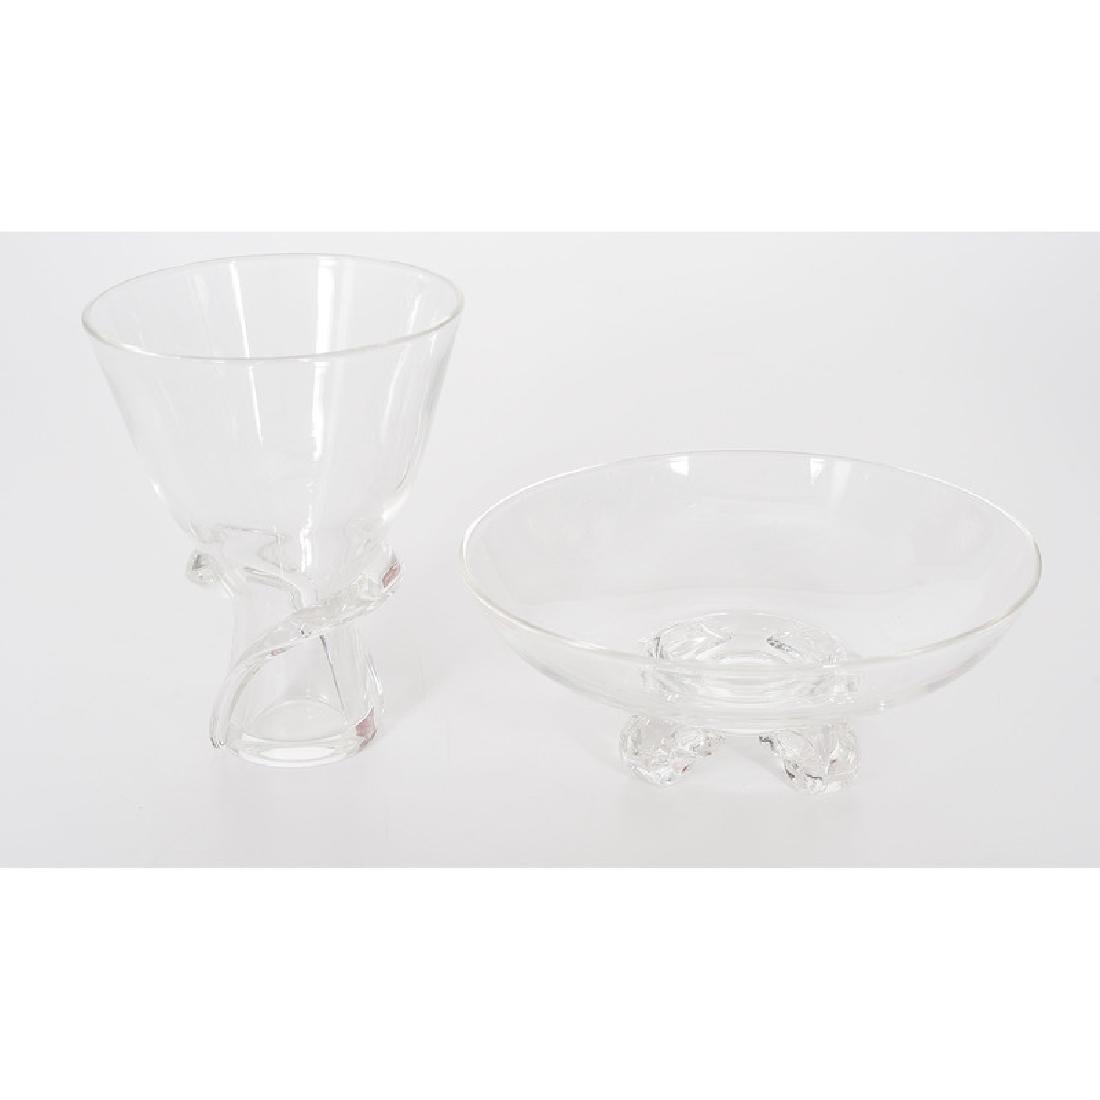 Steuben Crystal Vase and Bowl - 4